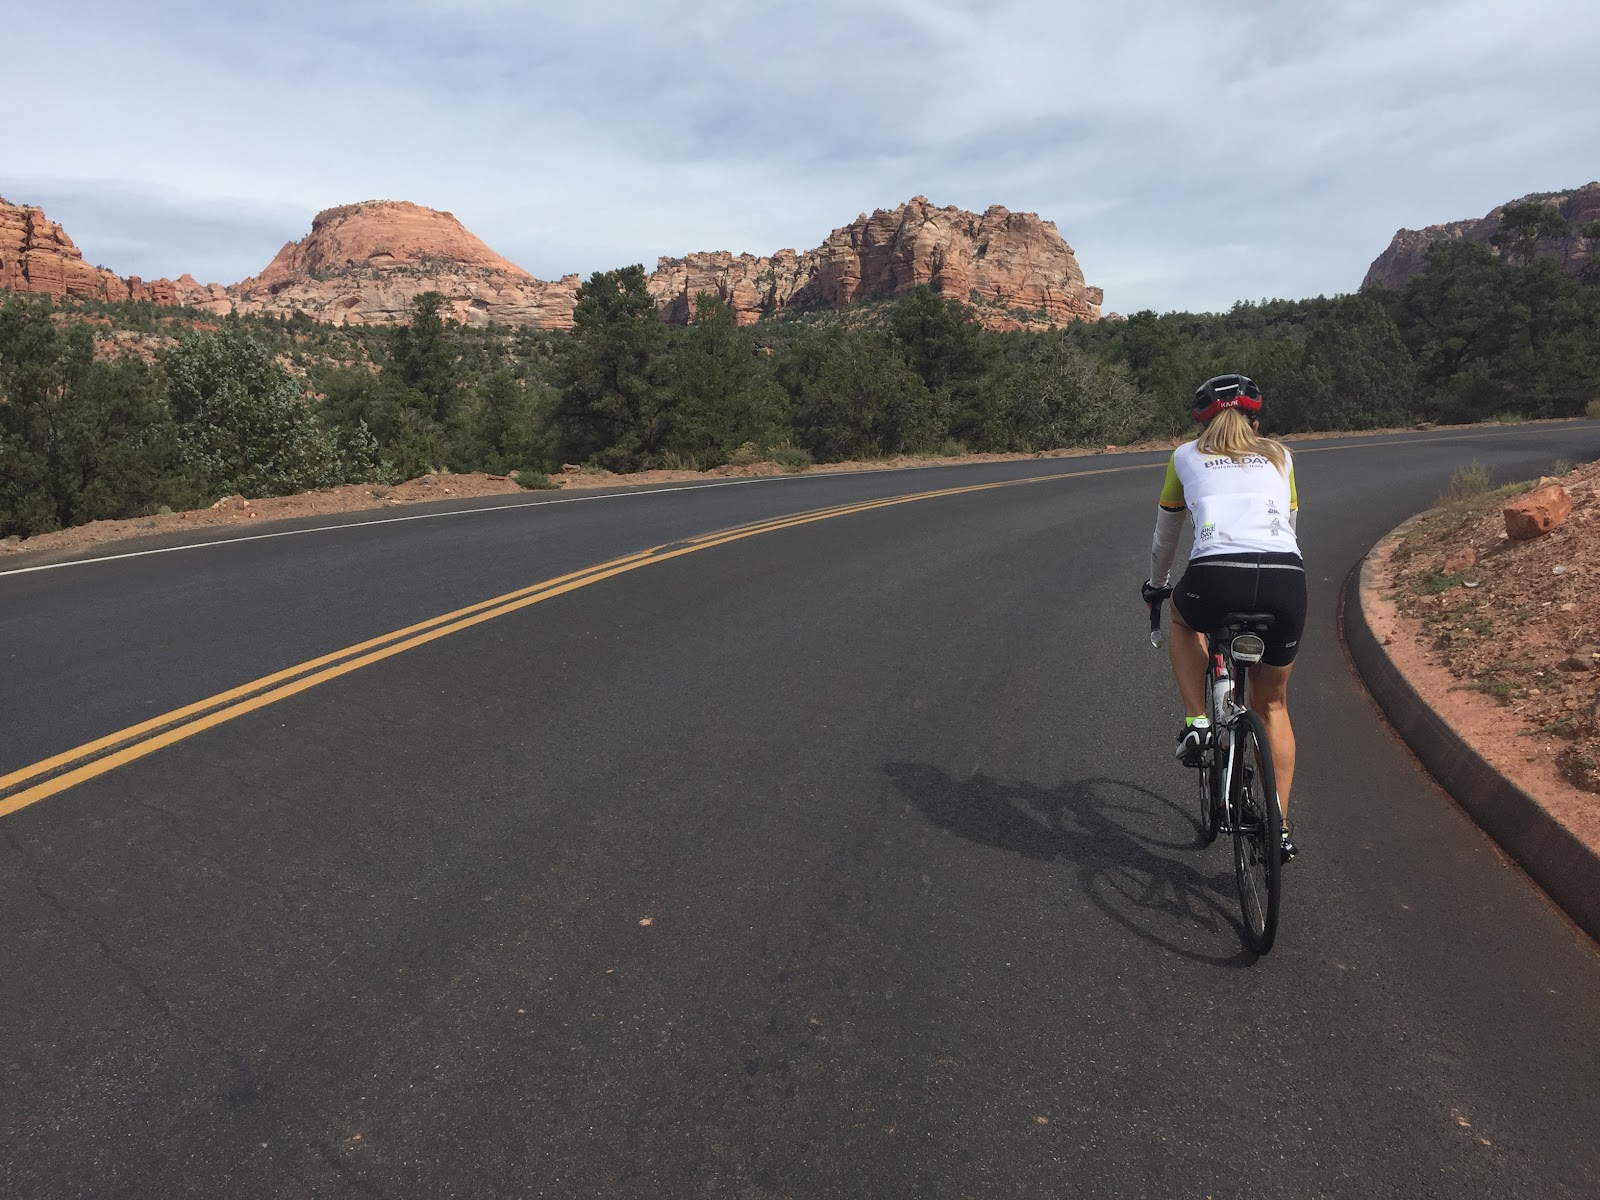 Cycling Kolob Terrace - cyclists riding towards mountains